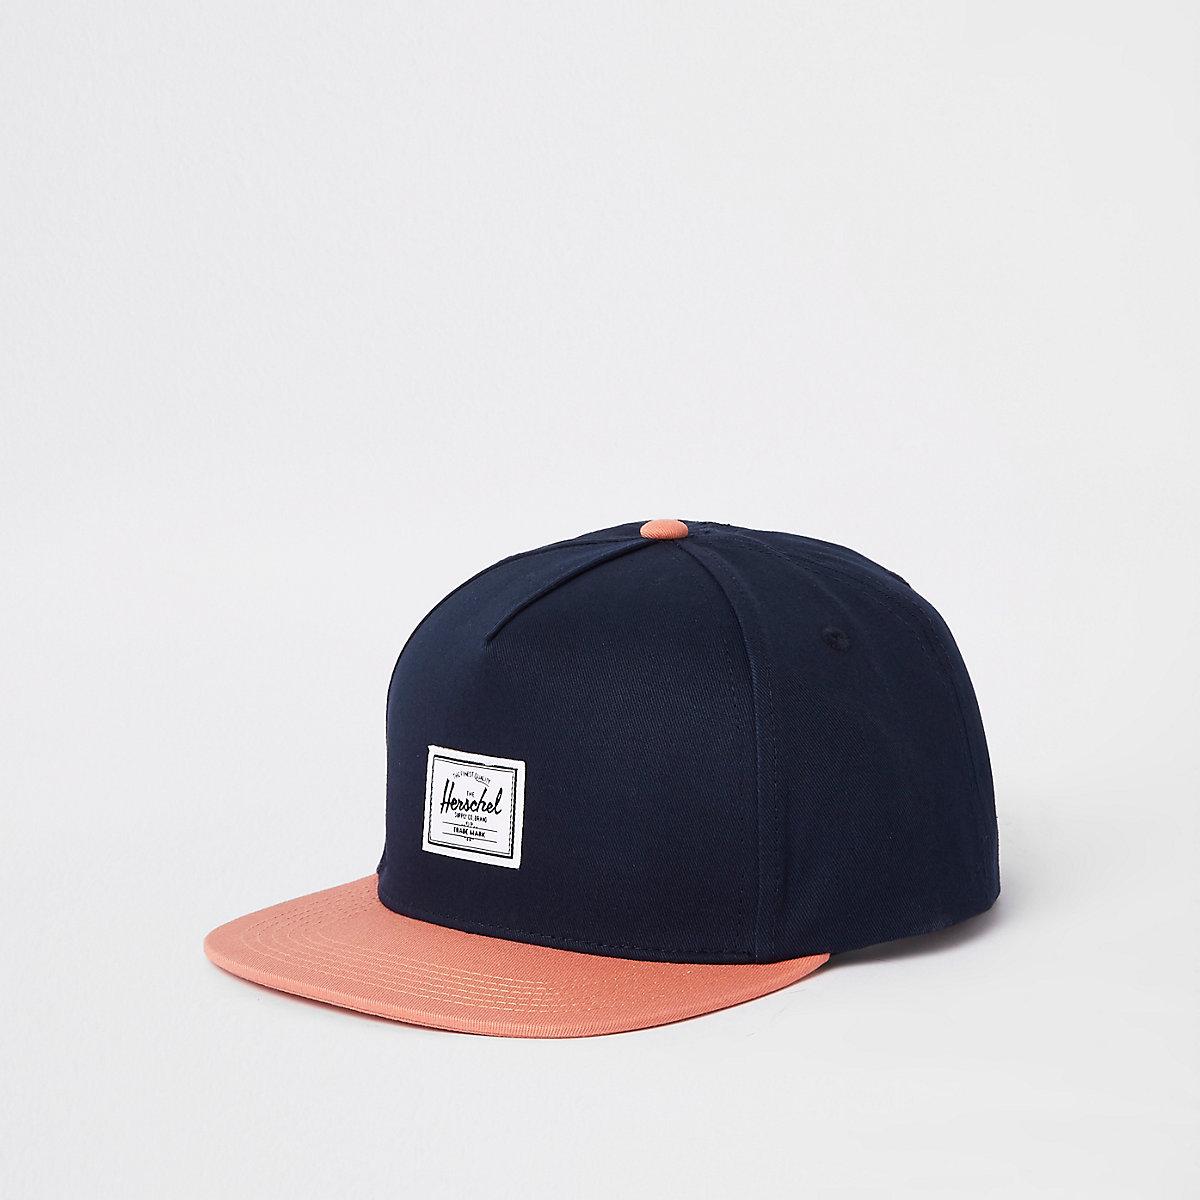 Herschel navy Dean cap - Hats   Caps - Accessories - men c9354a4e632